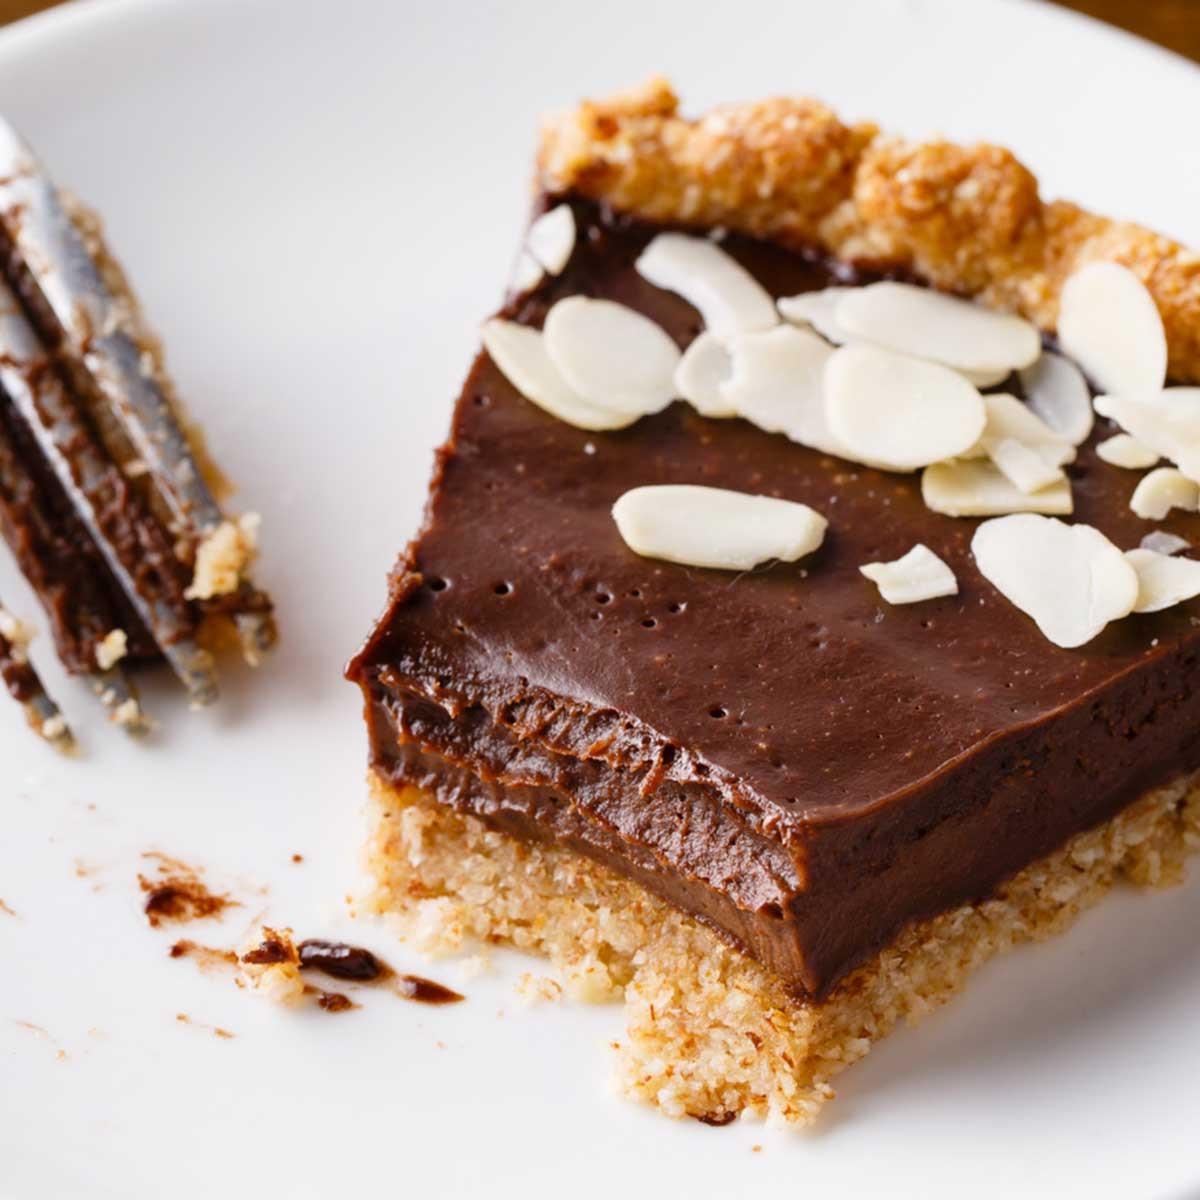 Chocolate Pie With Cocoa  Dark Chocolate Paleo Pie with Homemade Crust